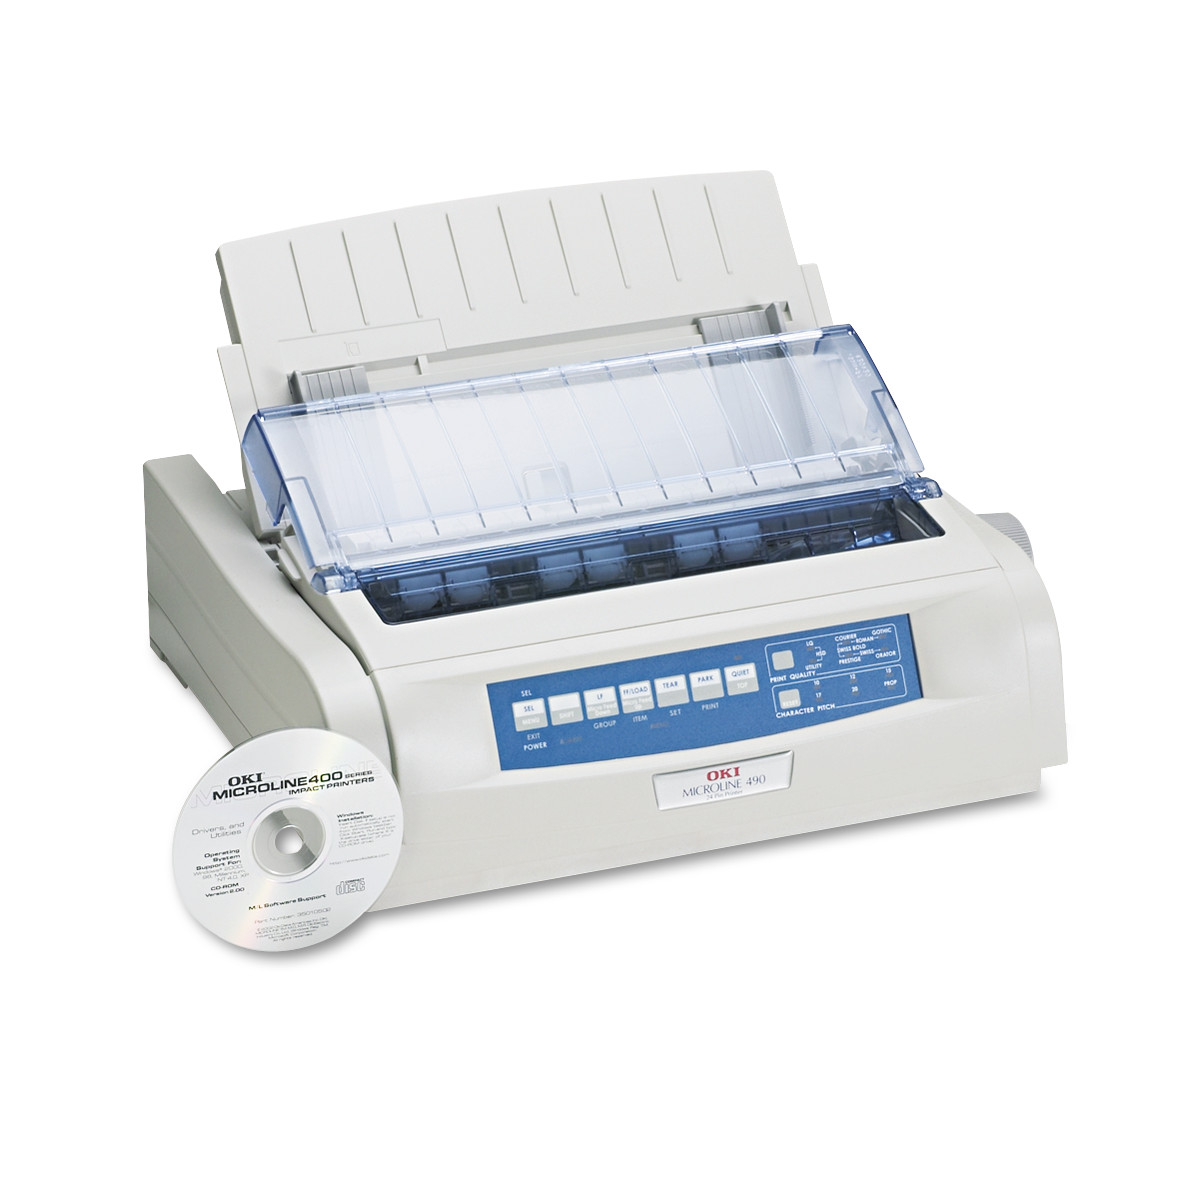 Oki Microline 490 24-Pin Dot Matrix Printer